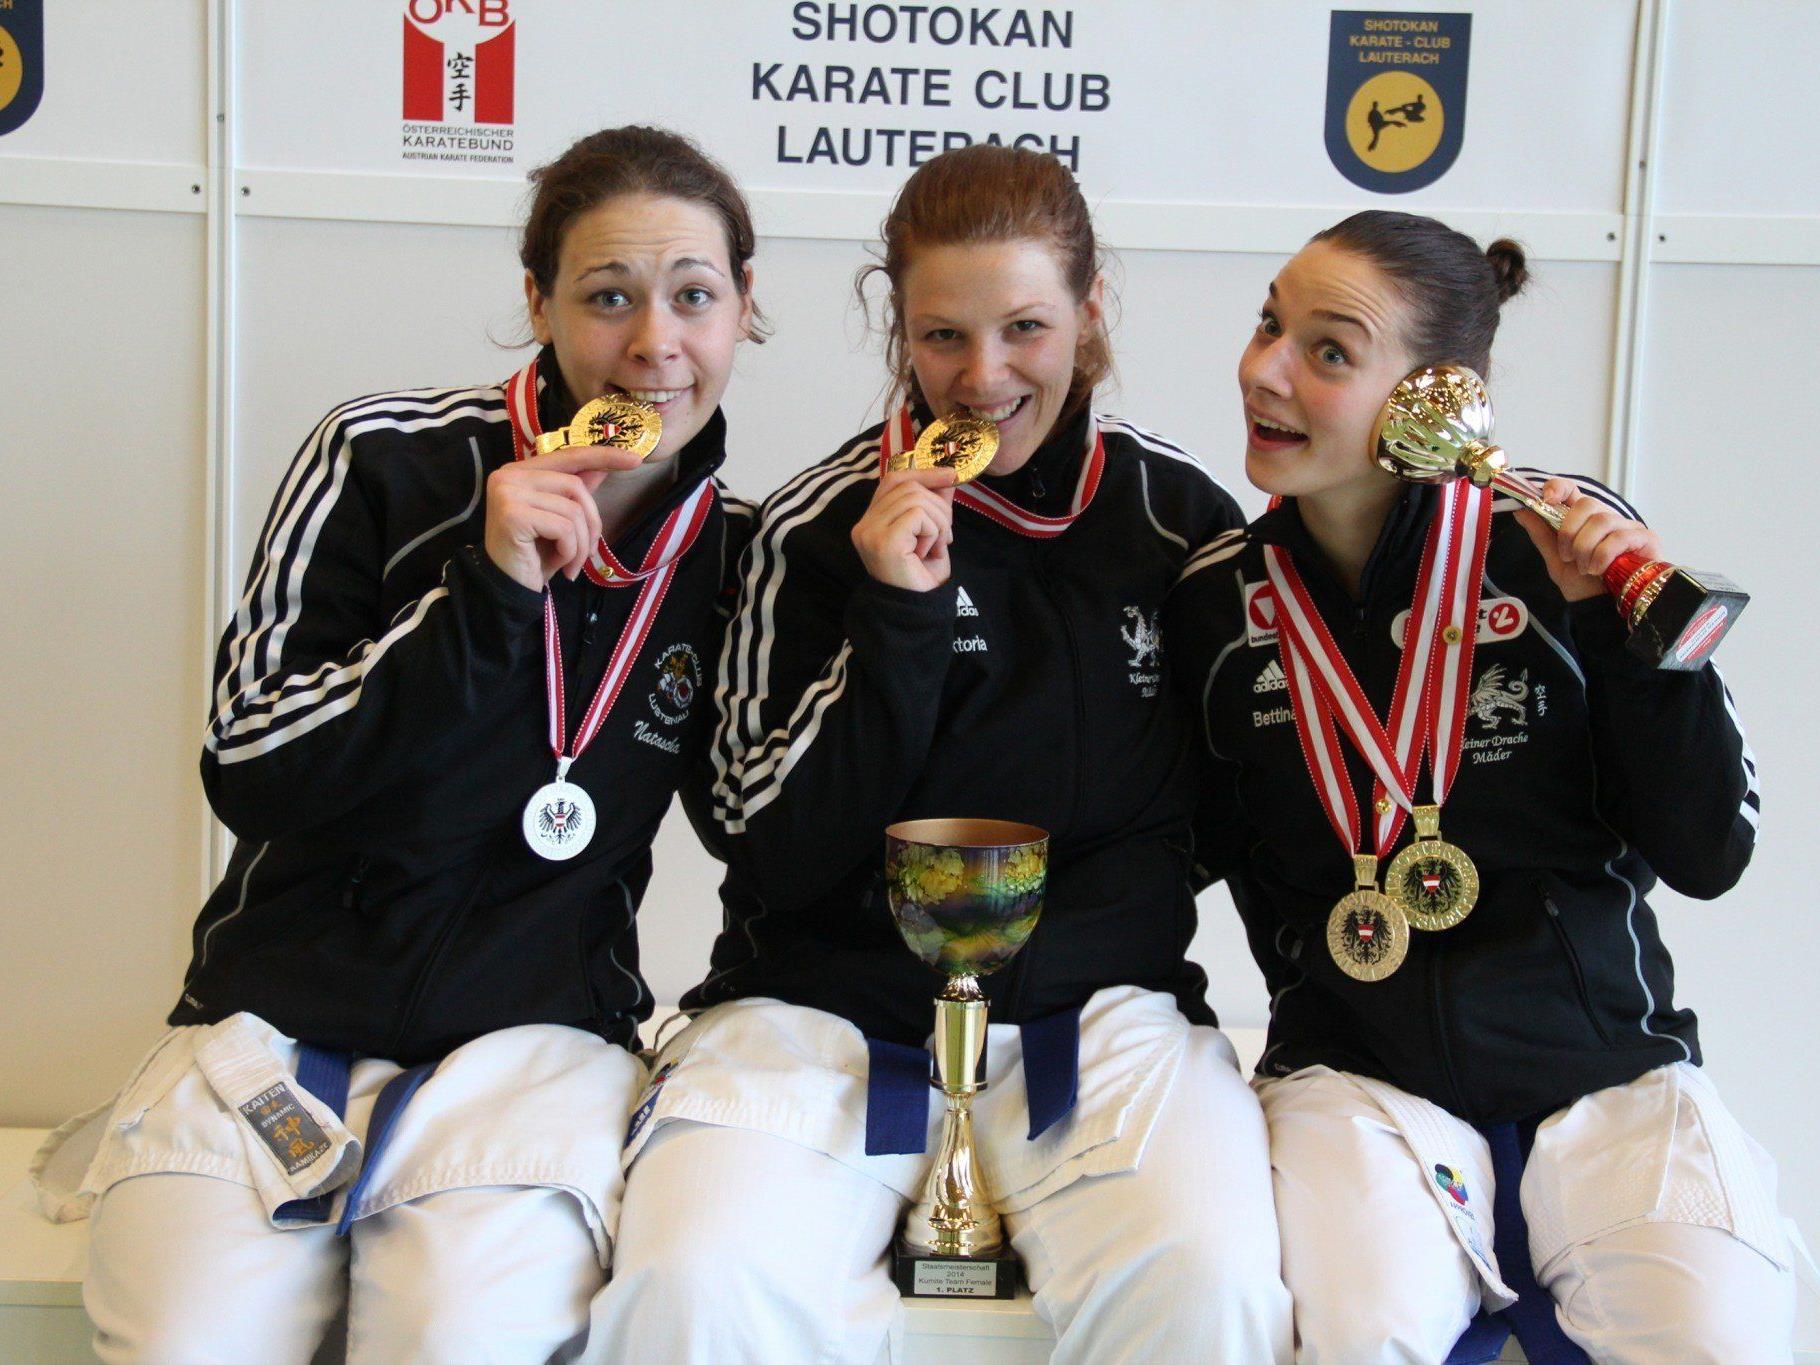 Team Gold: Natascha Aberer, Vicky Selinscheck, Bettina Plank